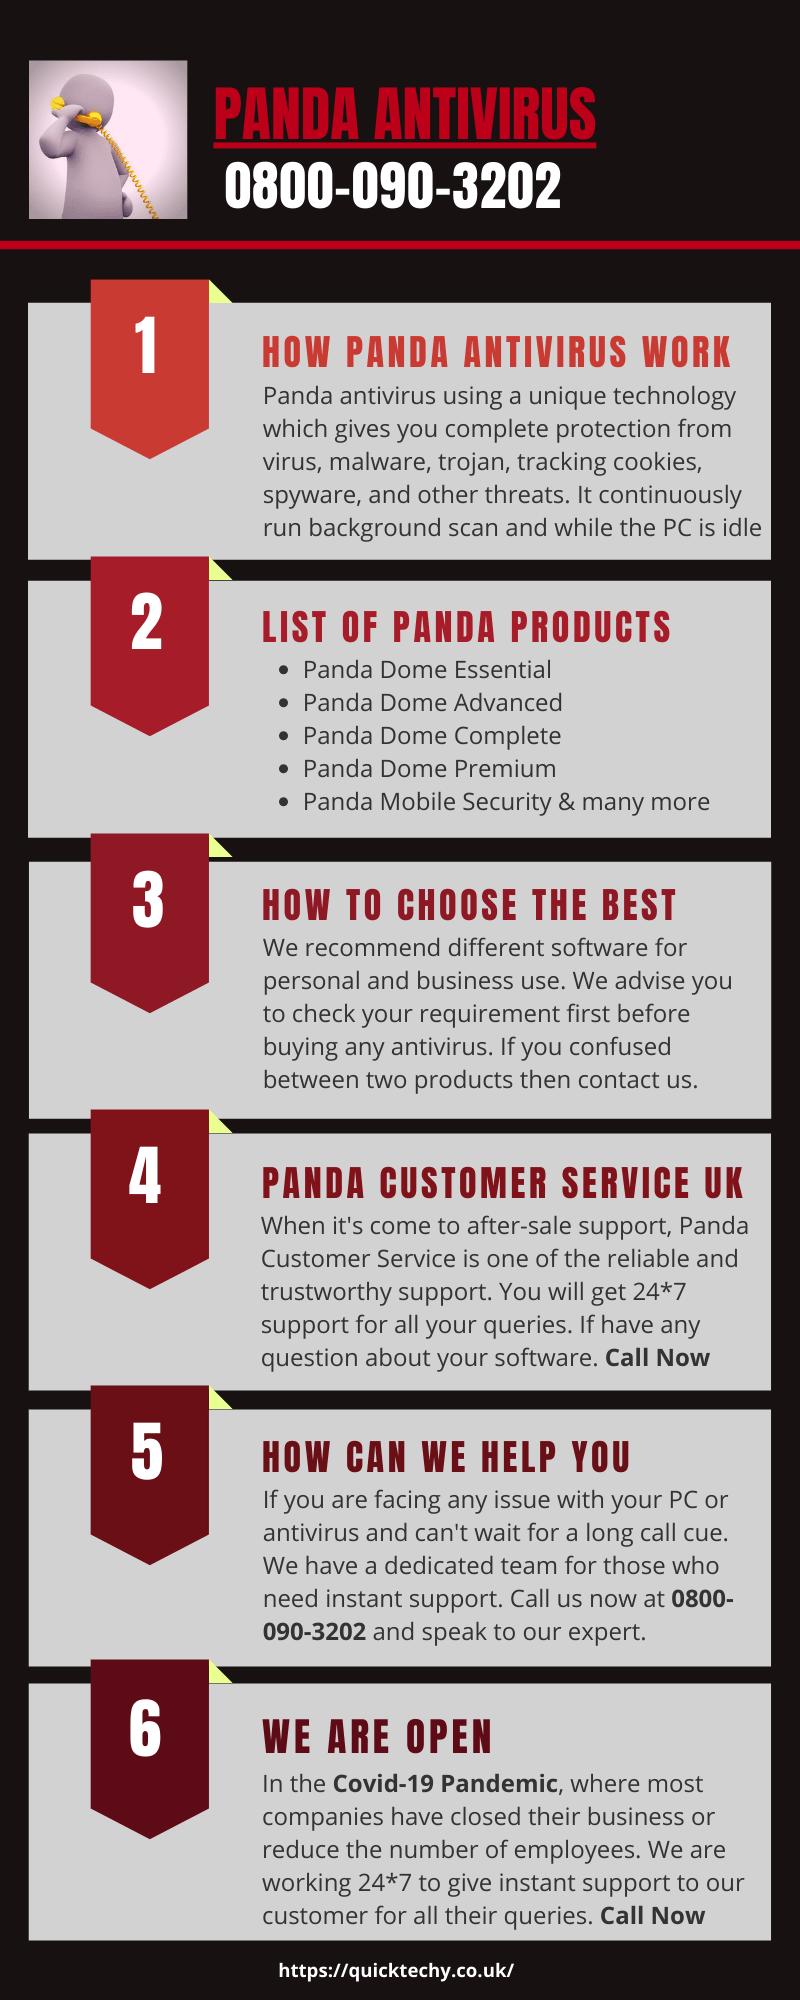 Panda Customer Service UK | 0800-090-3202